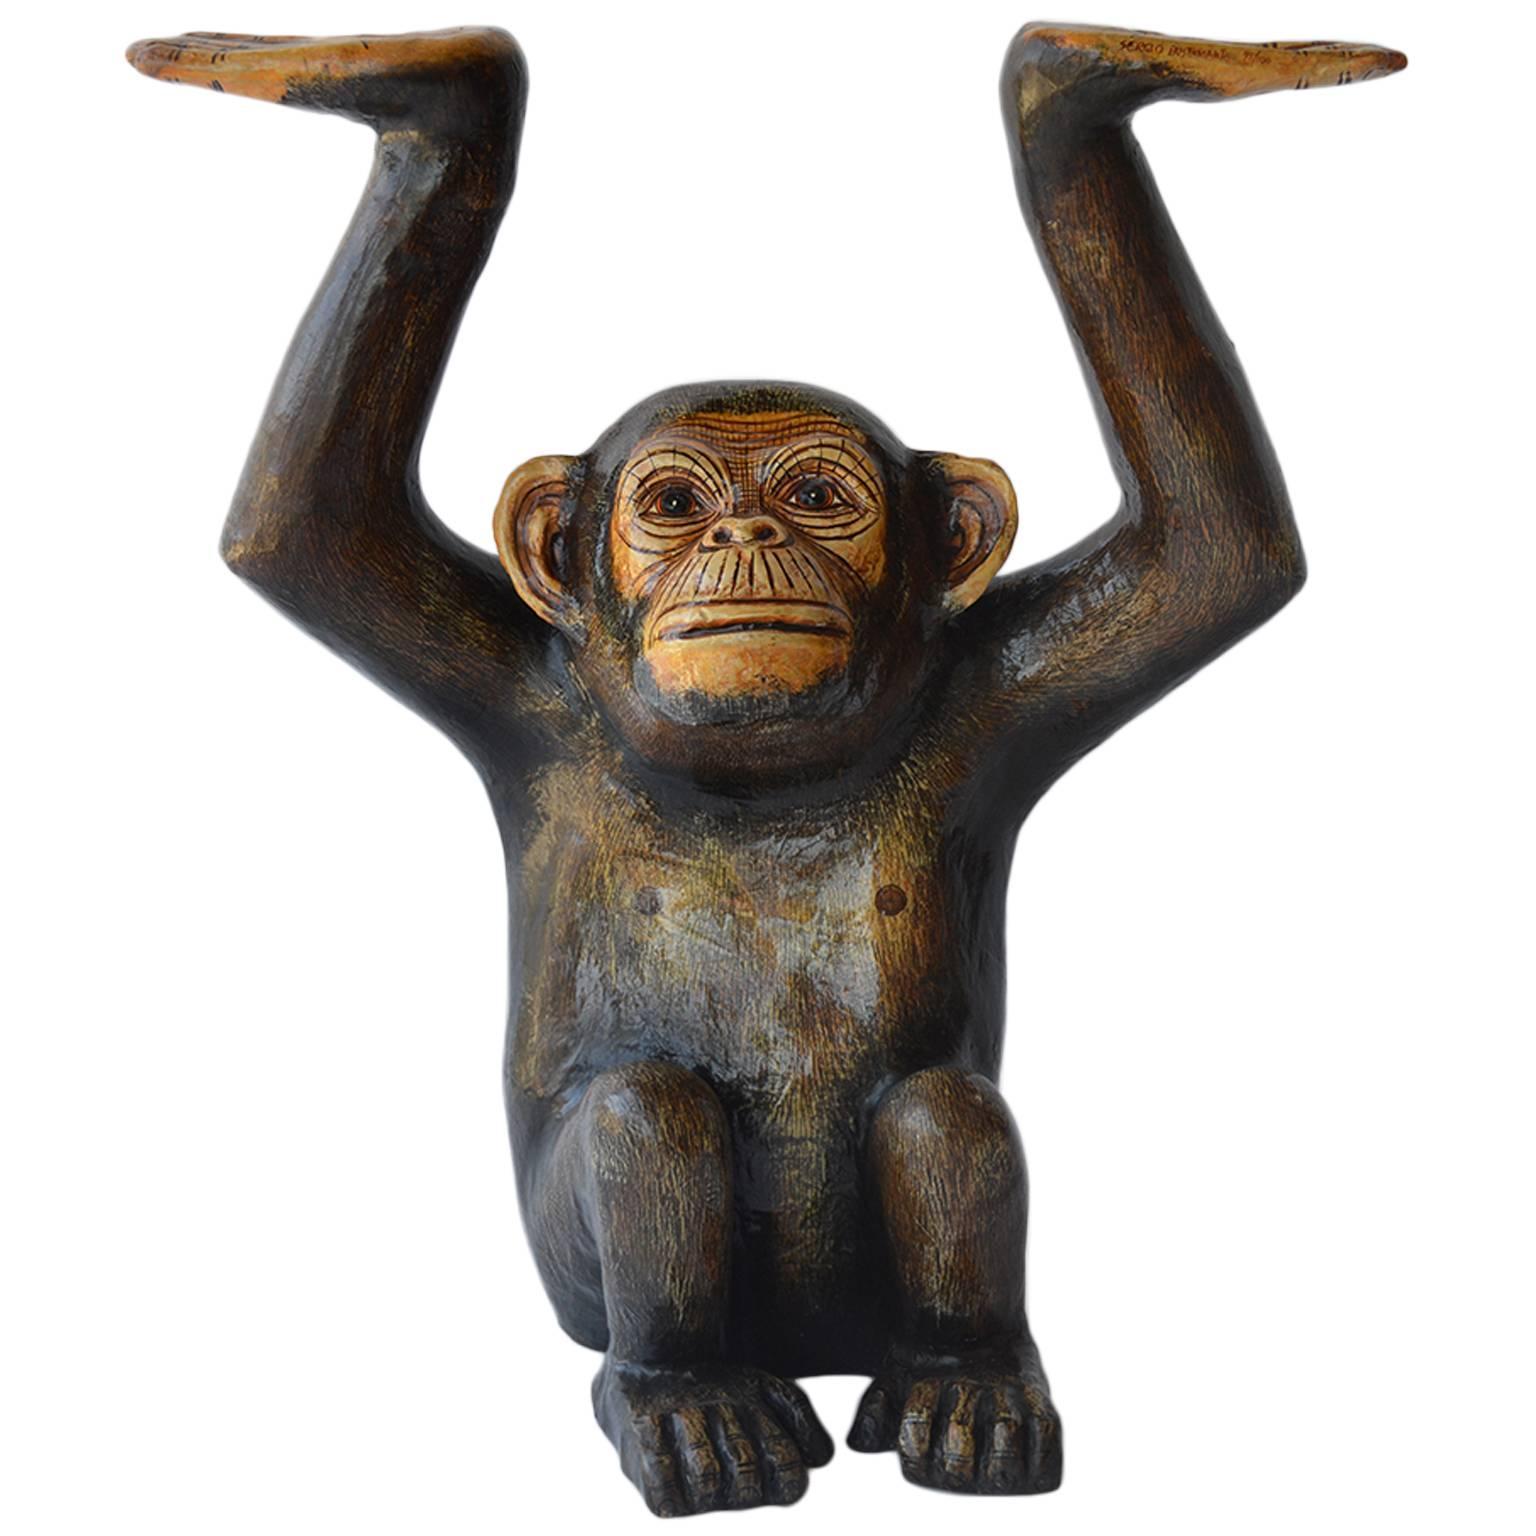 Papier Mâché Chimpanzee by Sergio Bustamante